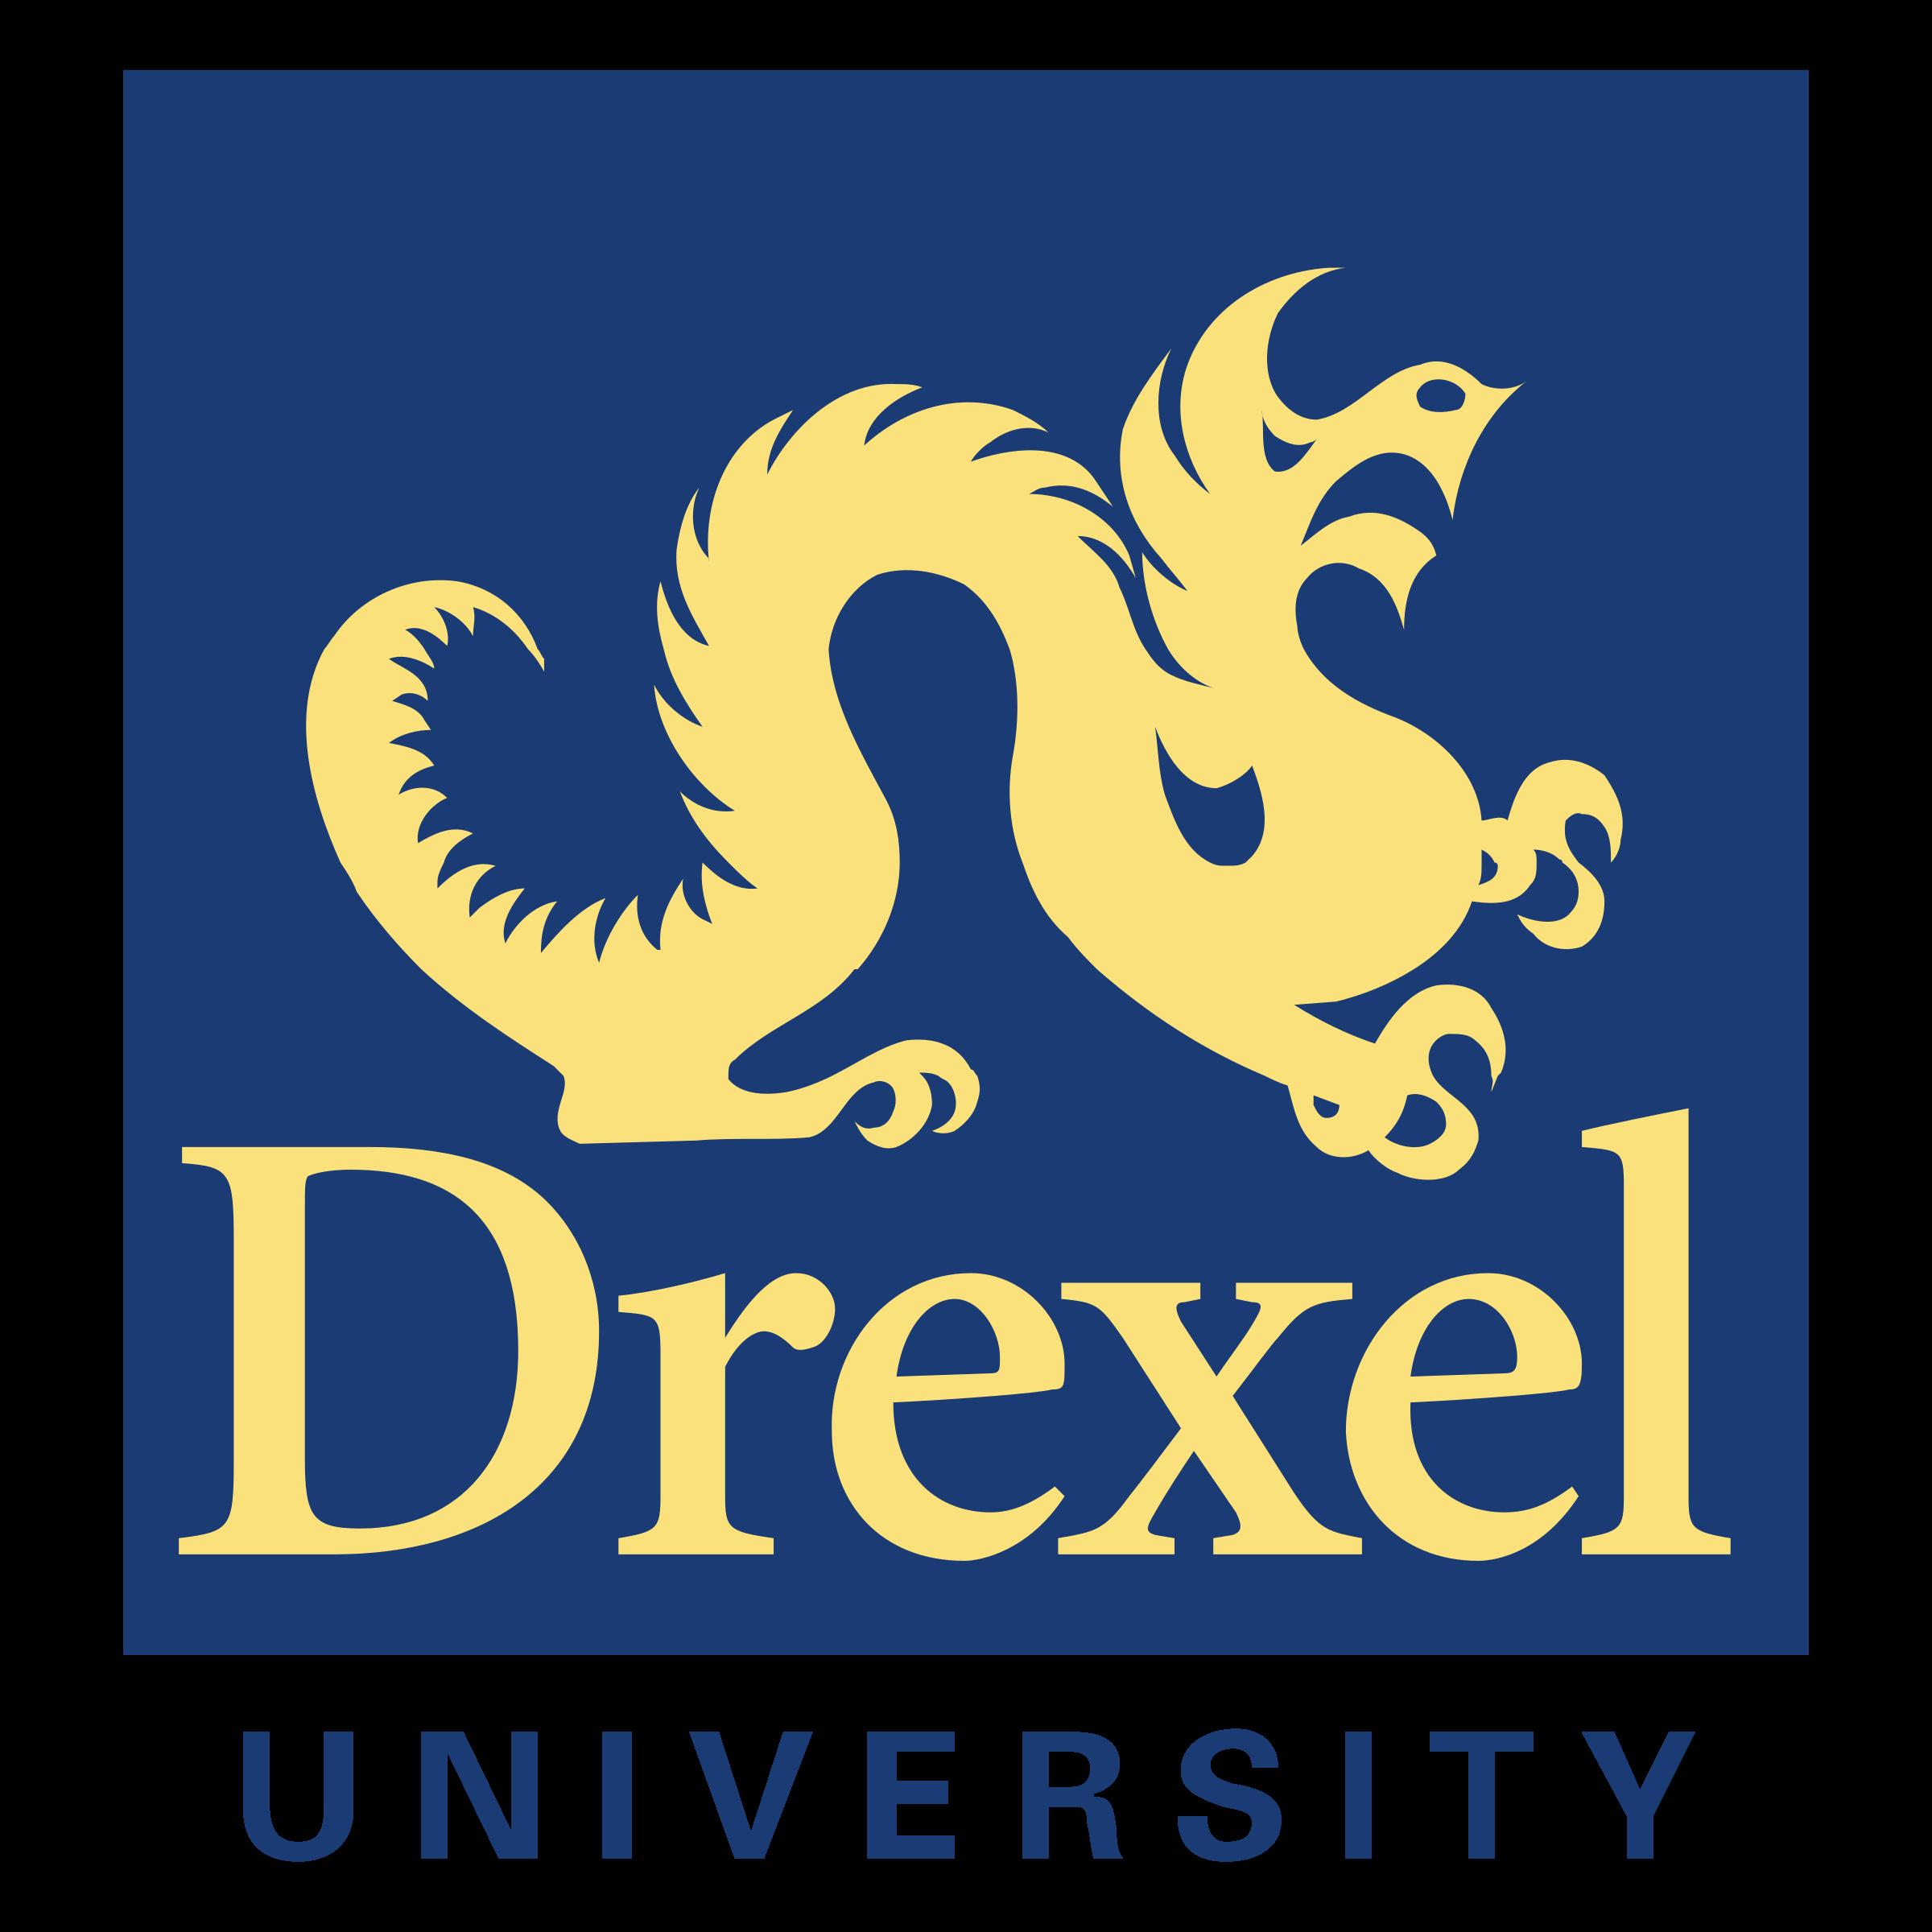 drexel-university-logo-png-transparent.png